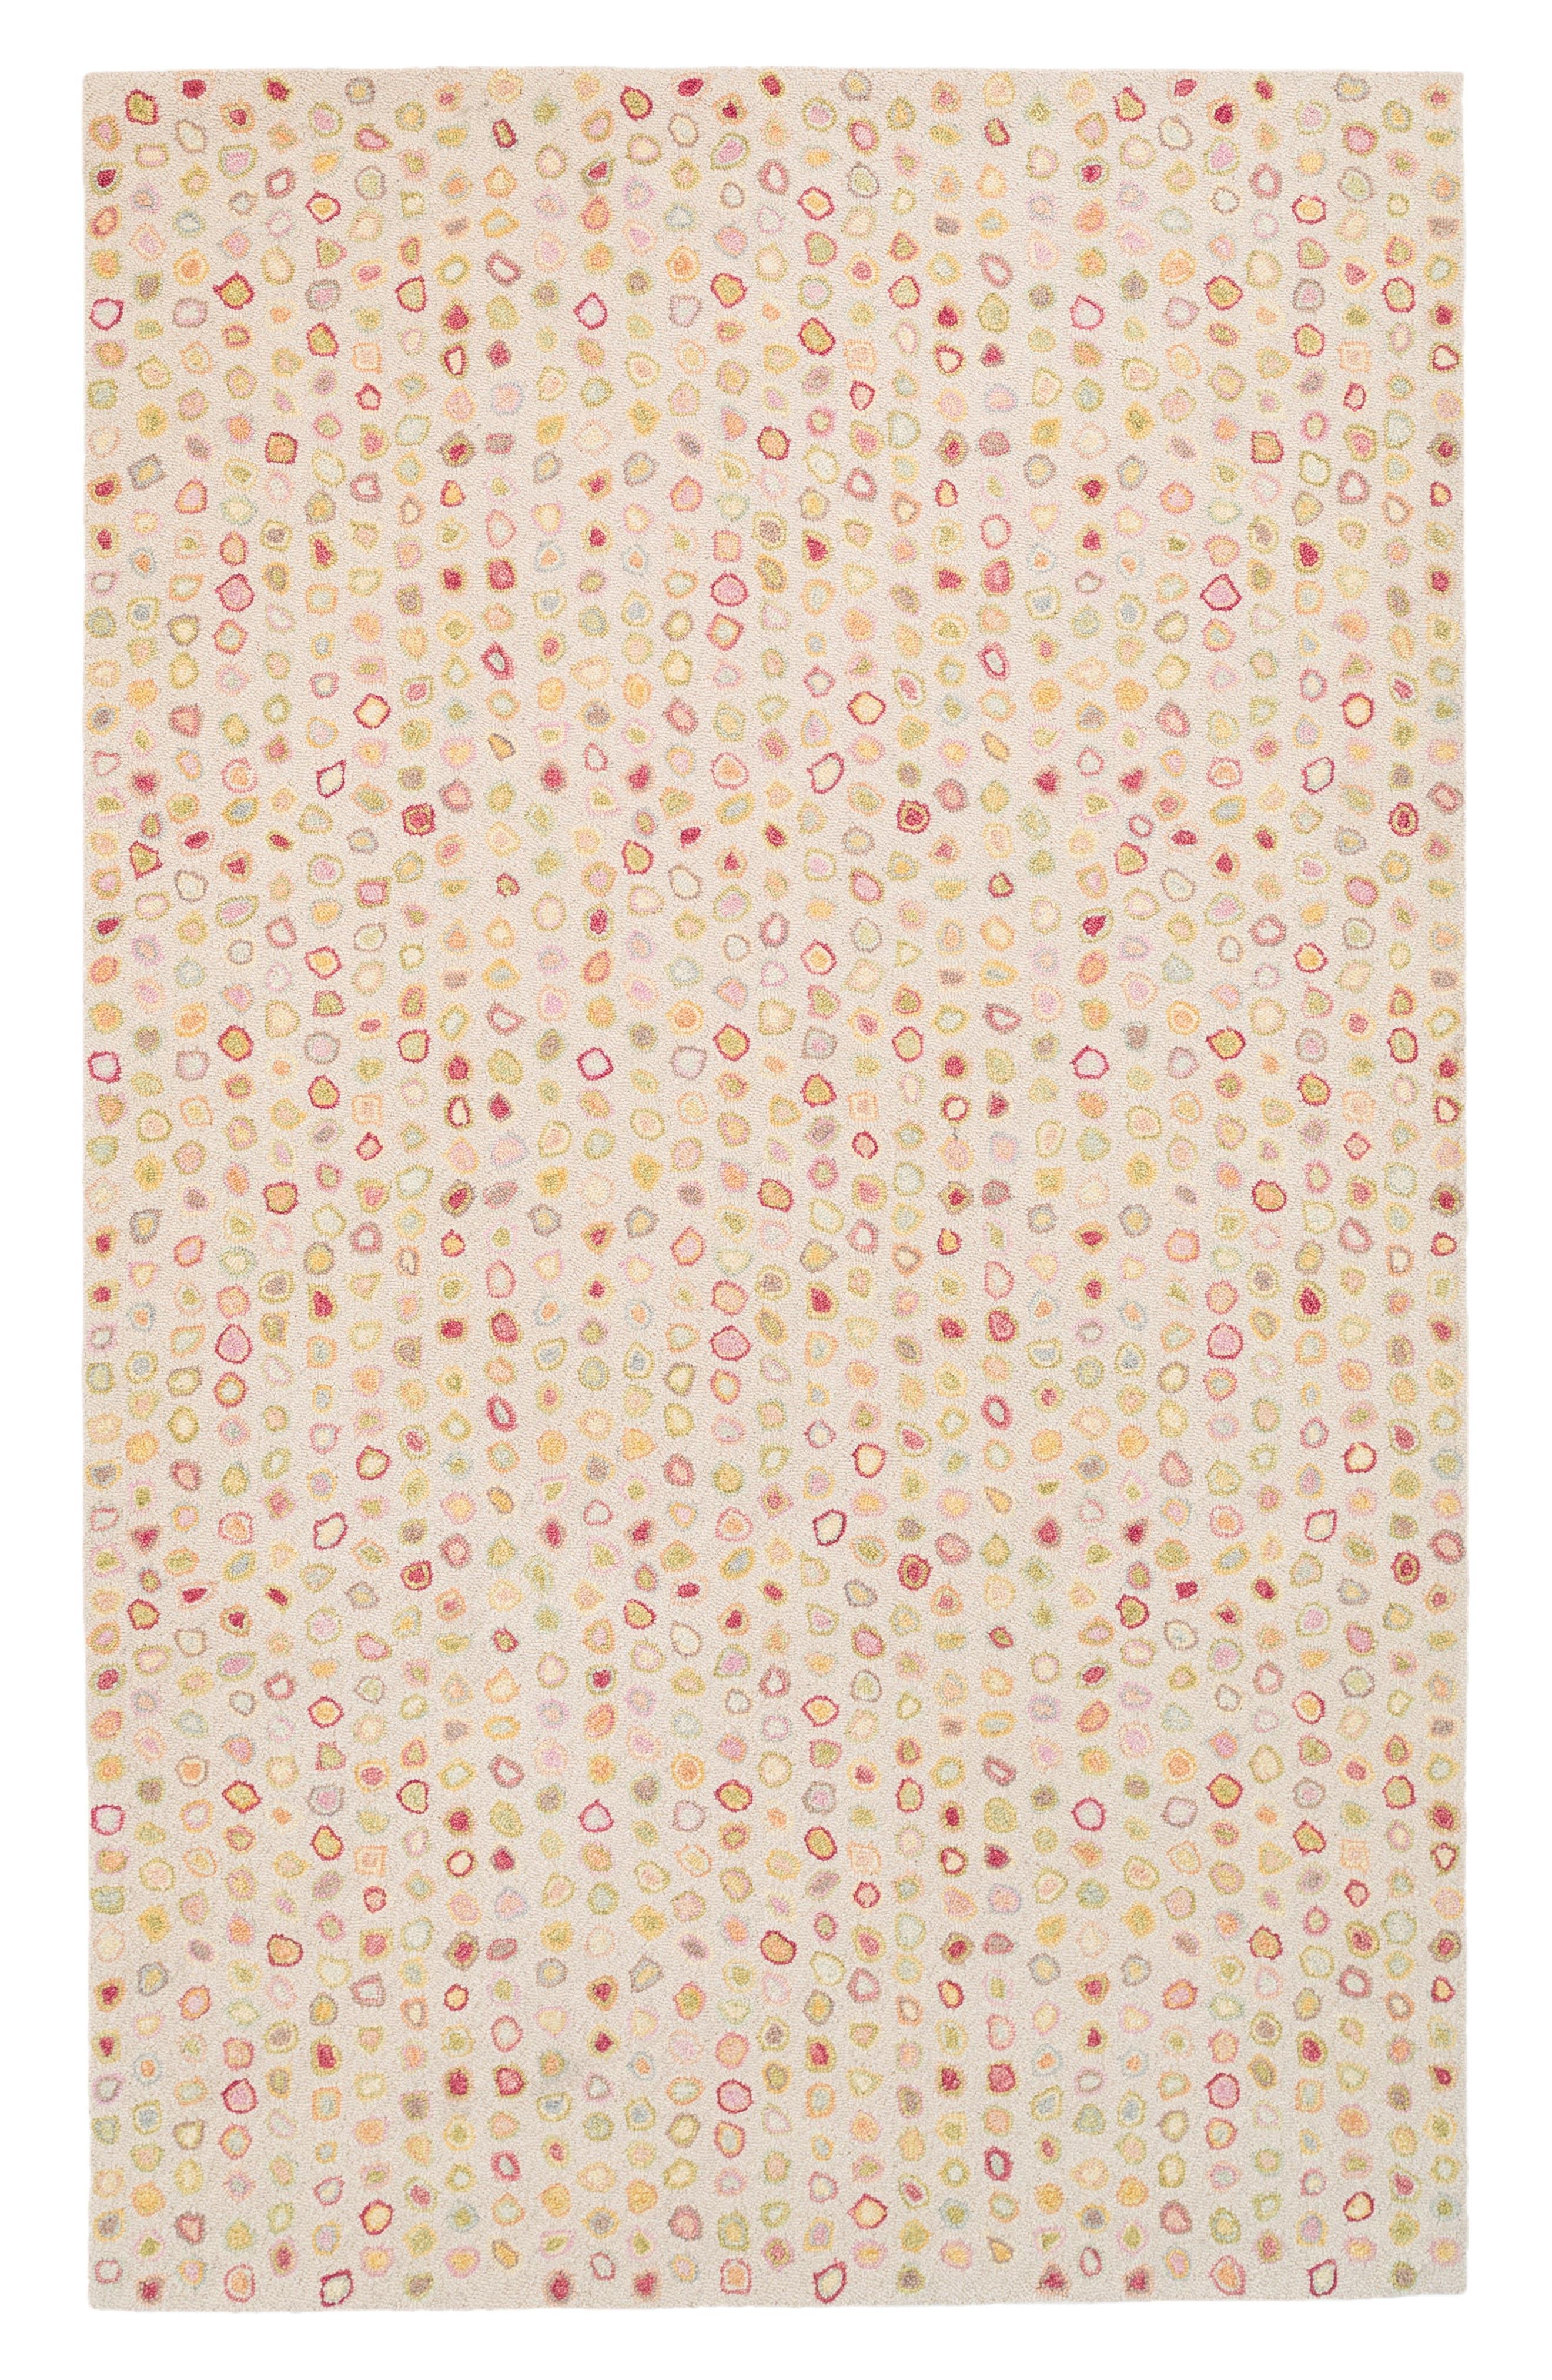 Cat's Paw Pastel Wool Rug,                             Main thumbnail 1, color,                             PINK